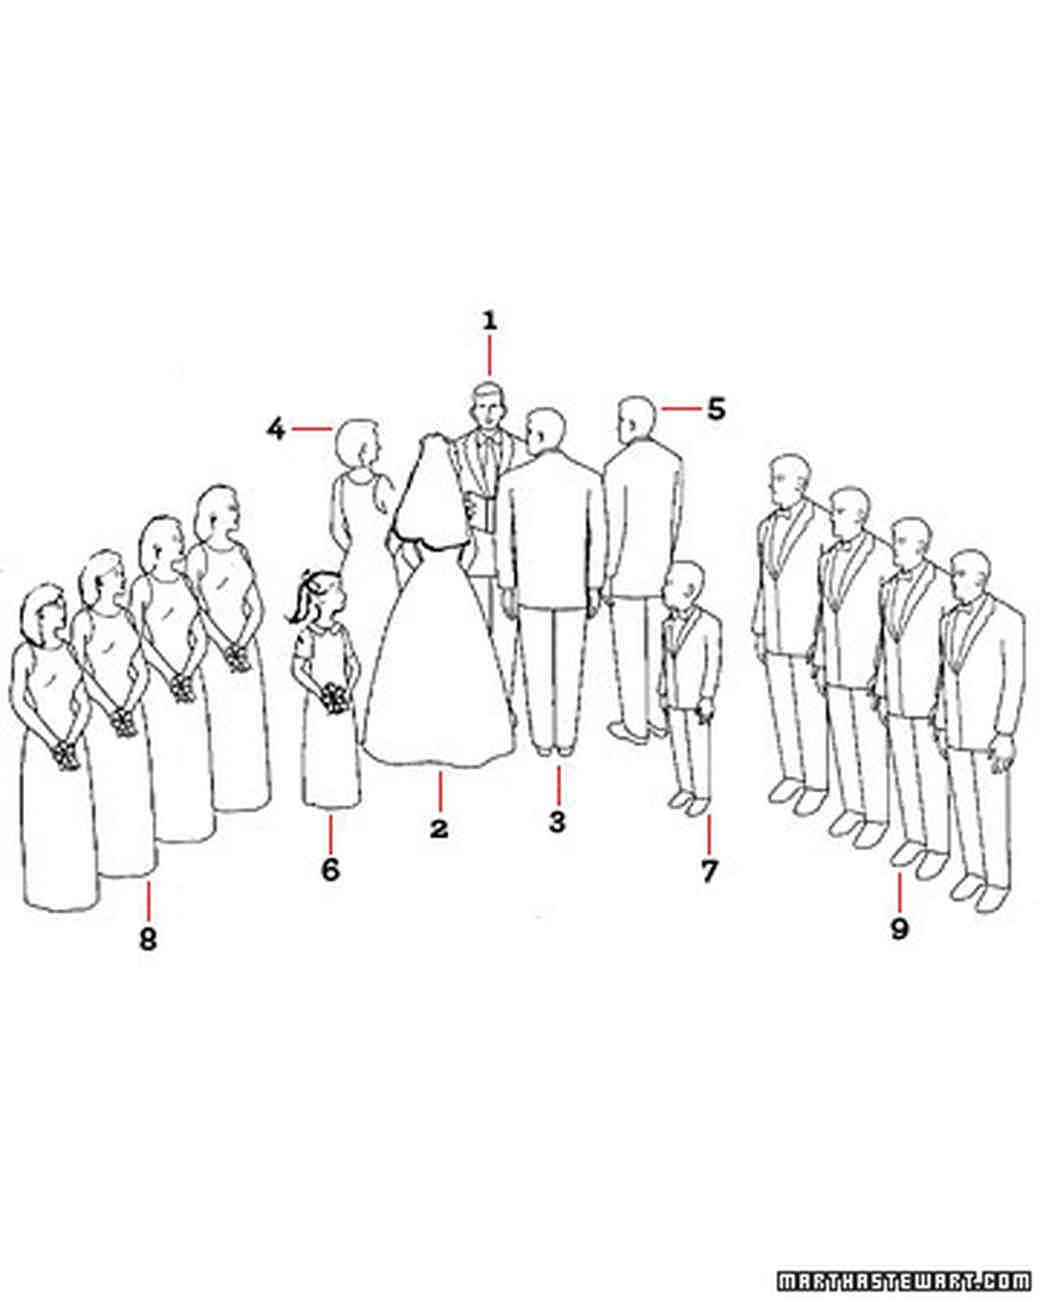 wa_win98_ceremonyc_xl?itok=5GvLHy7m diagram your big day christian wedding ceremony basics martha